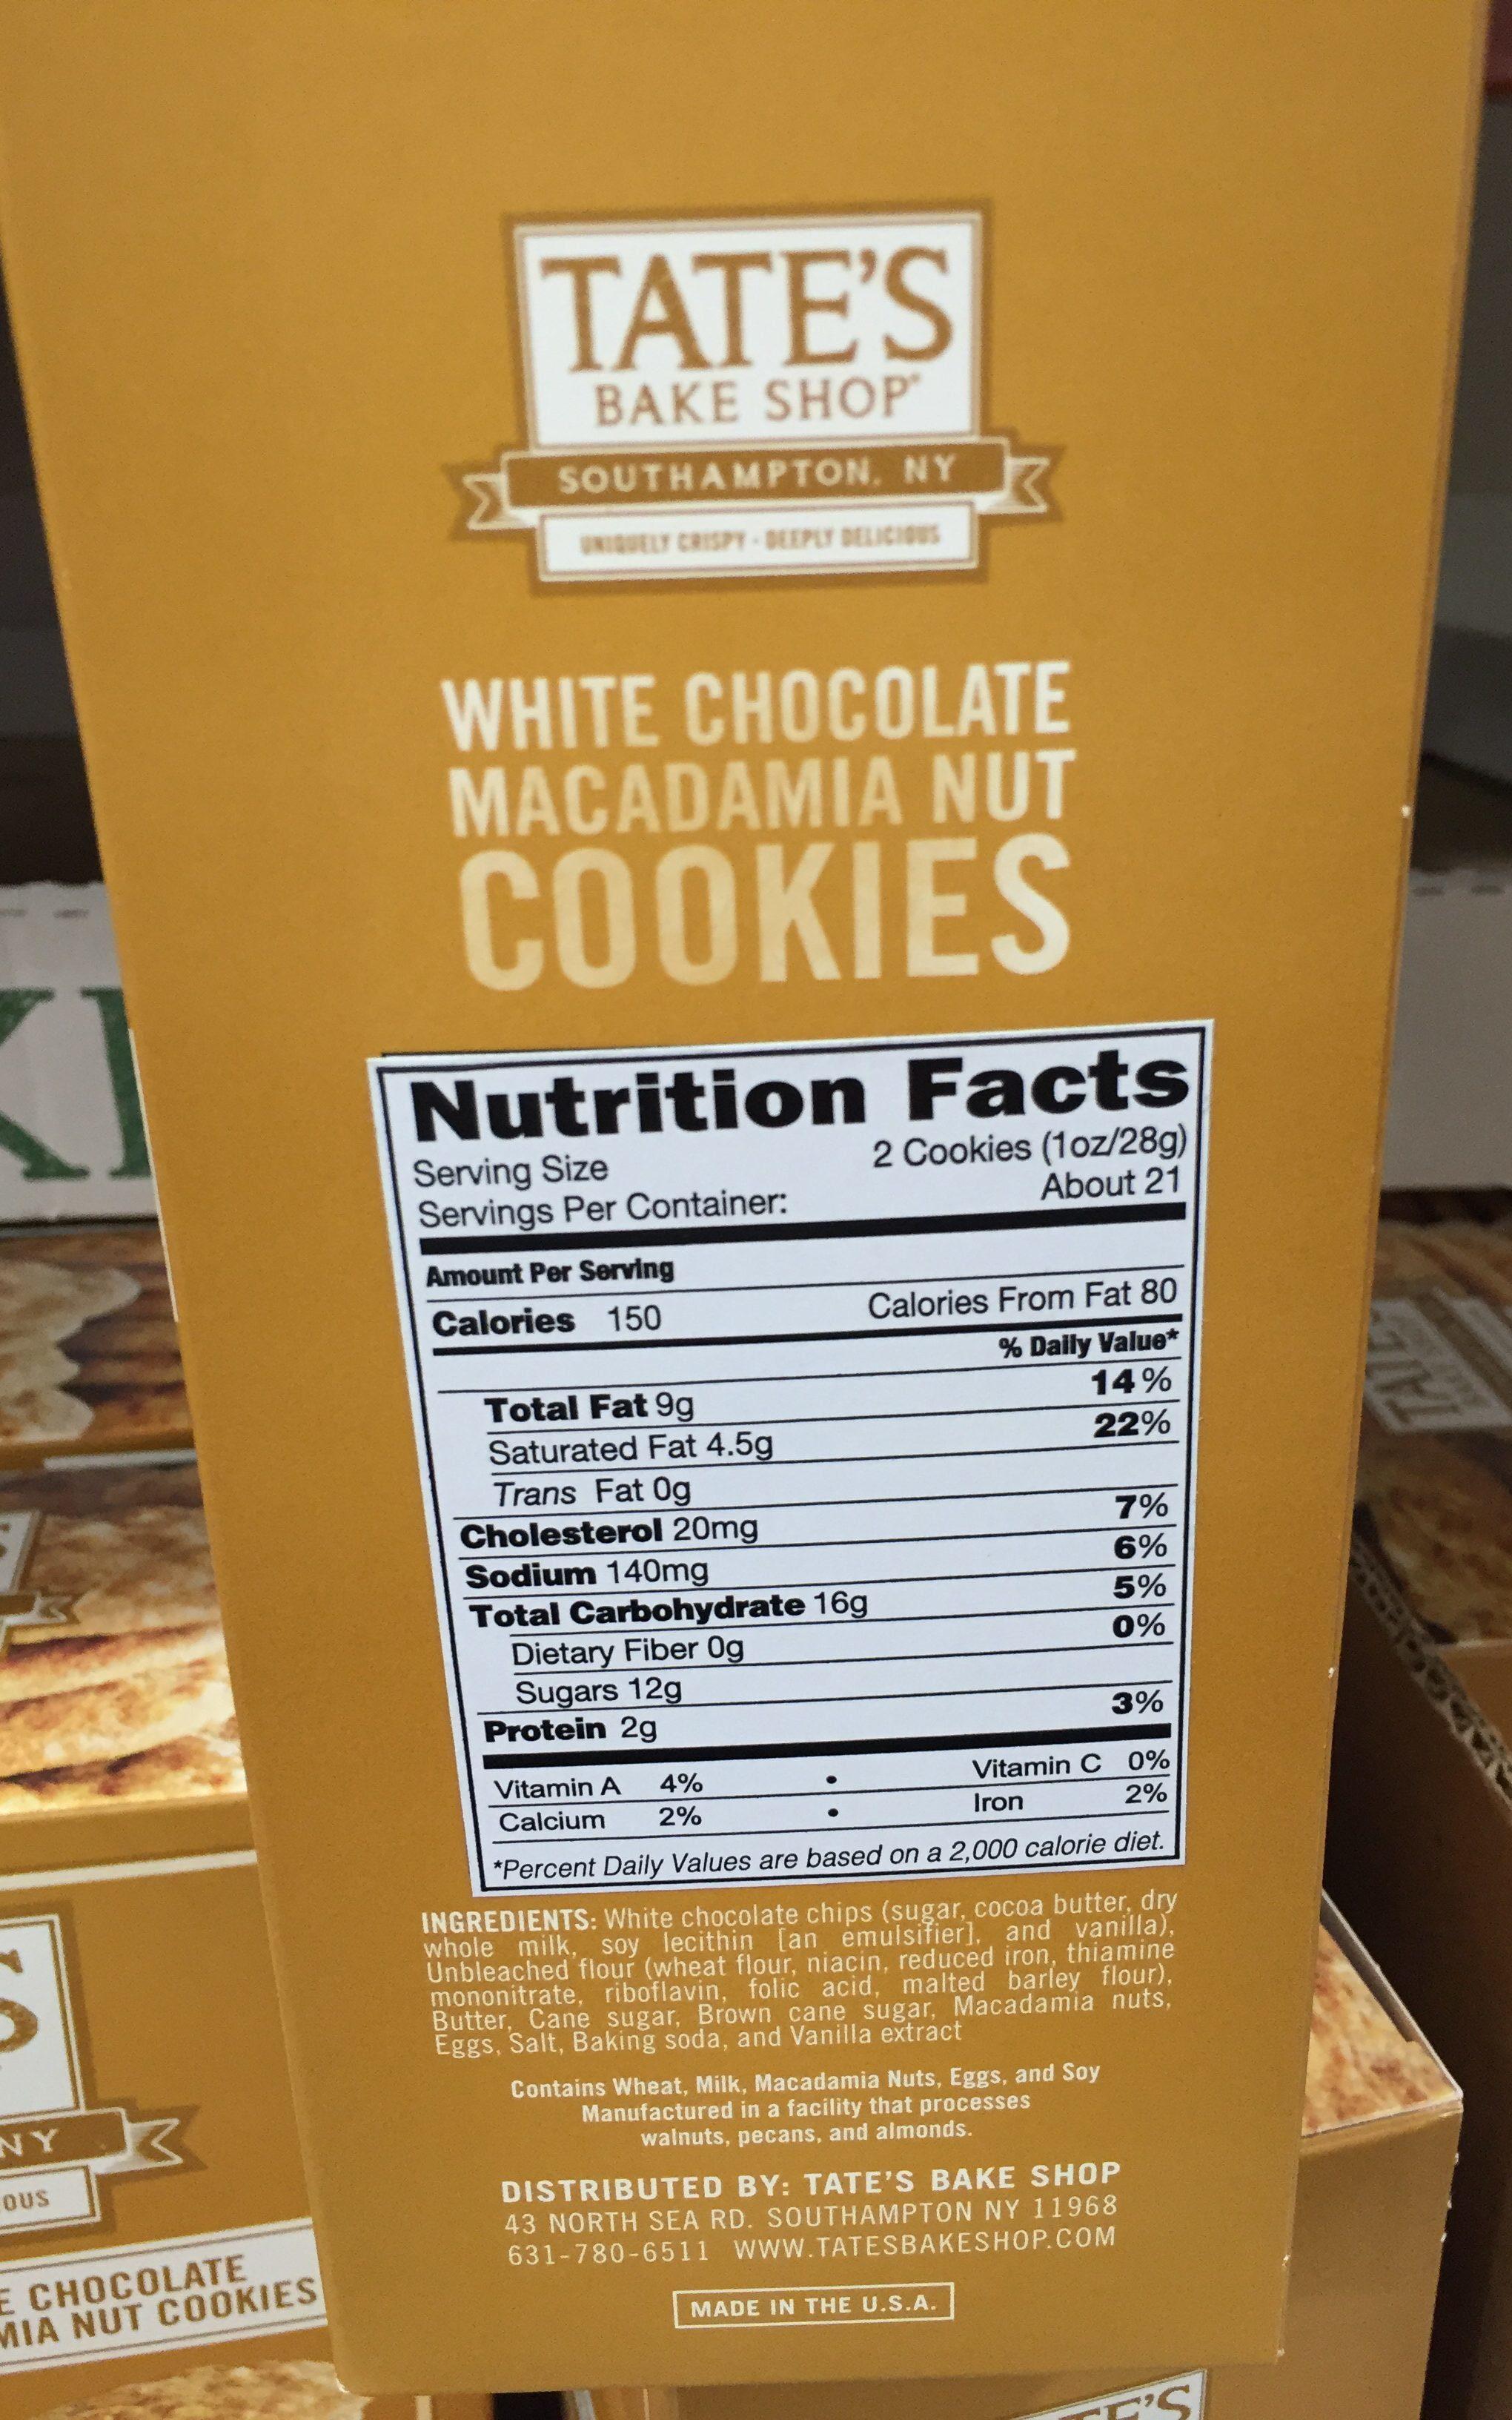 Tate's Crispy White Chocolate Macadamia Cookies Nutrition